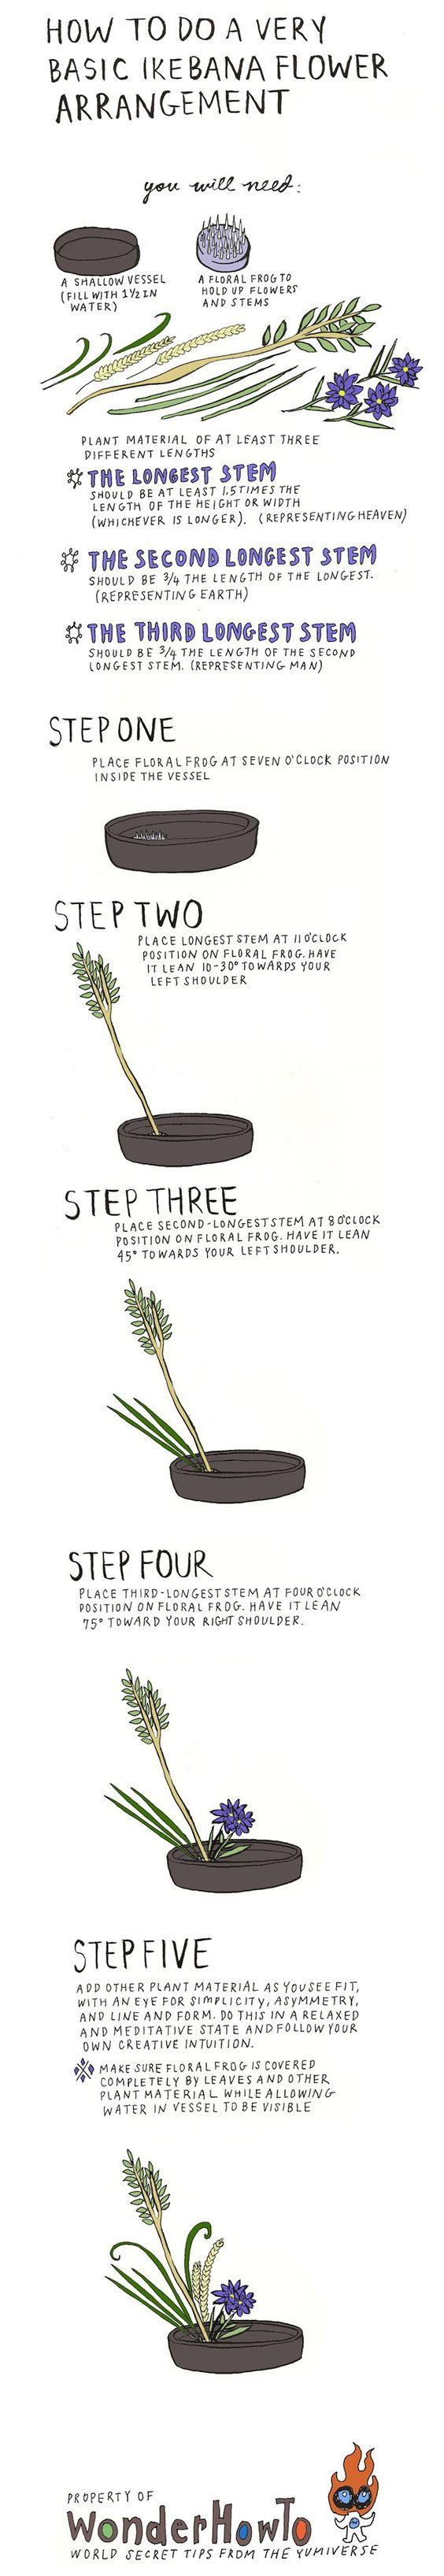 infografía para hacer un arreglo de ikebana.